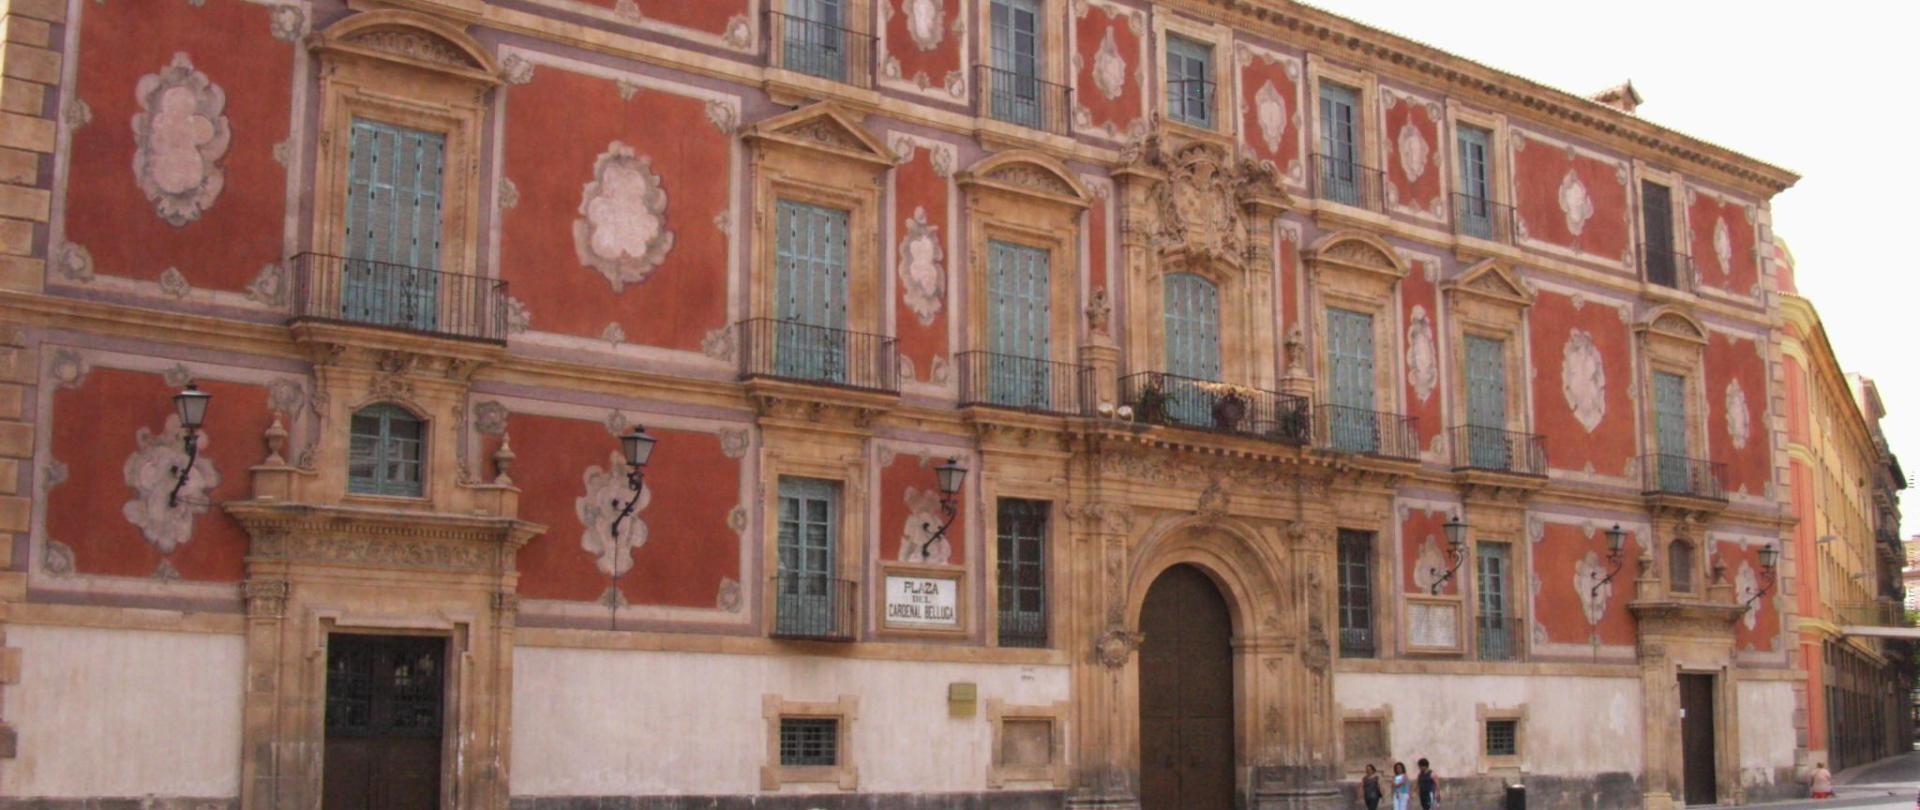 Obispado_de_Murcia.jpg